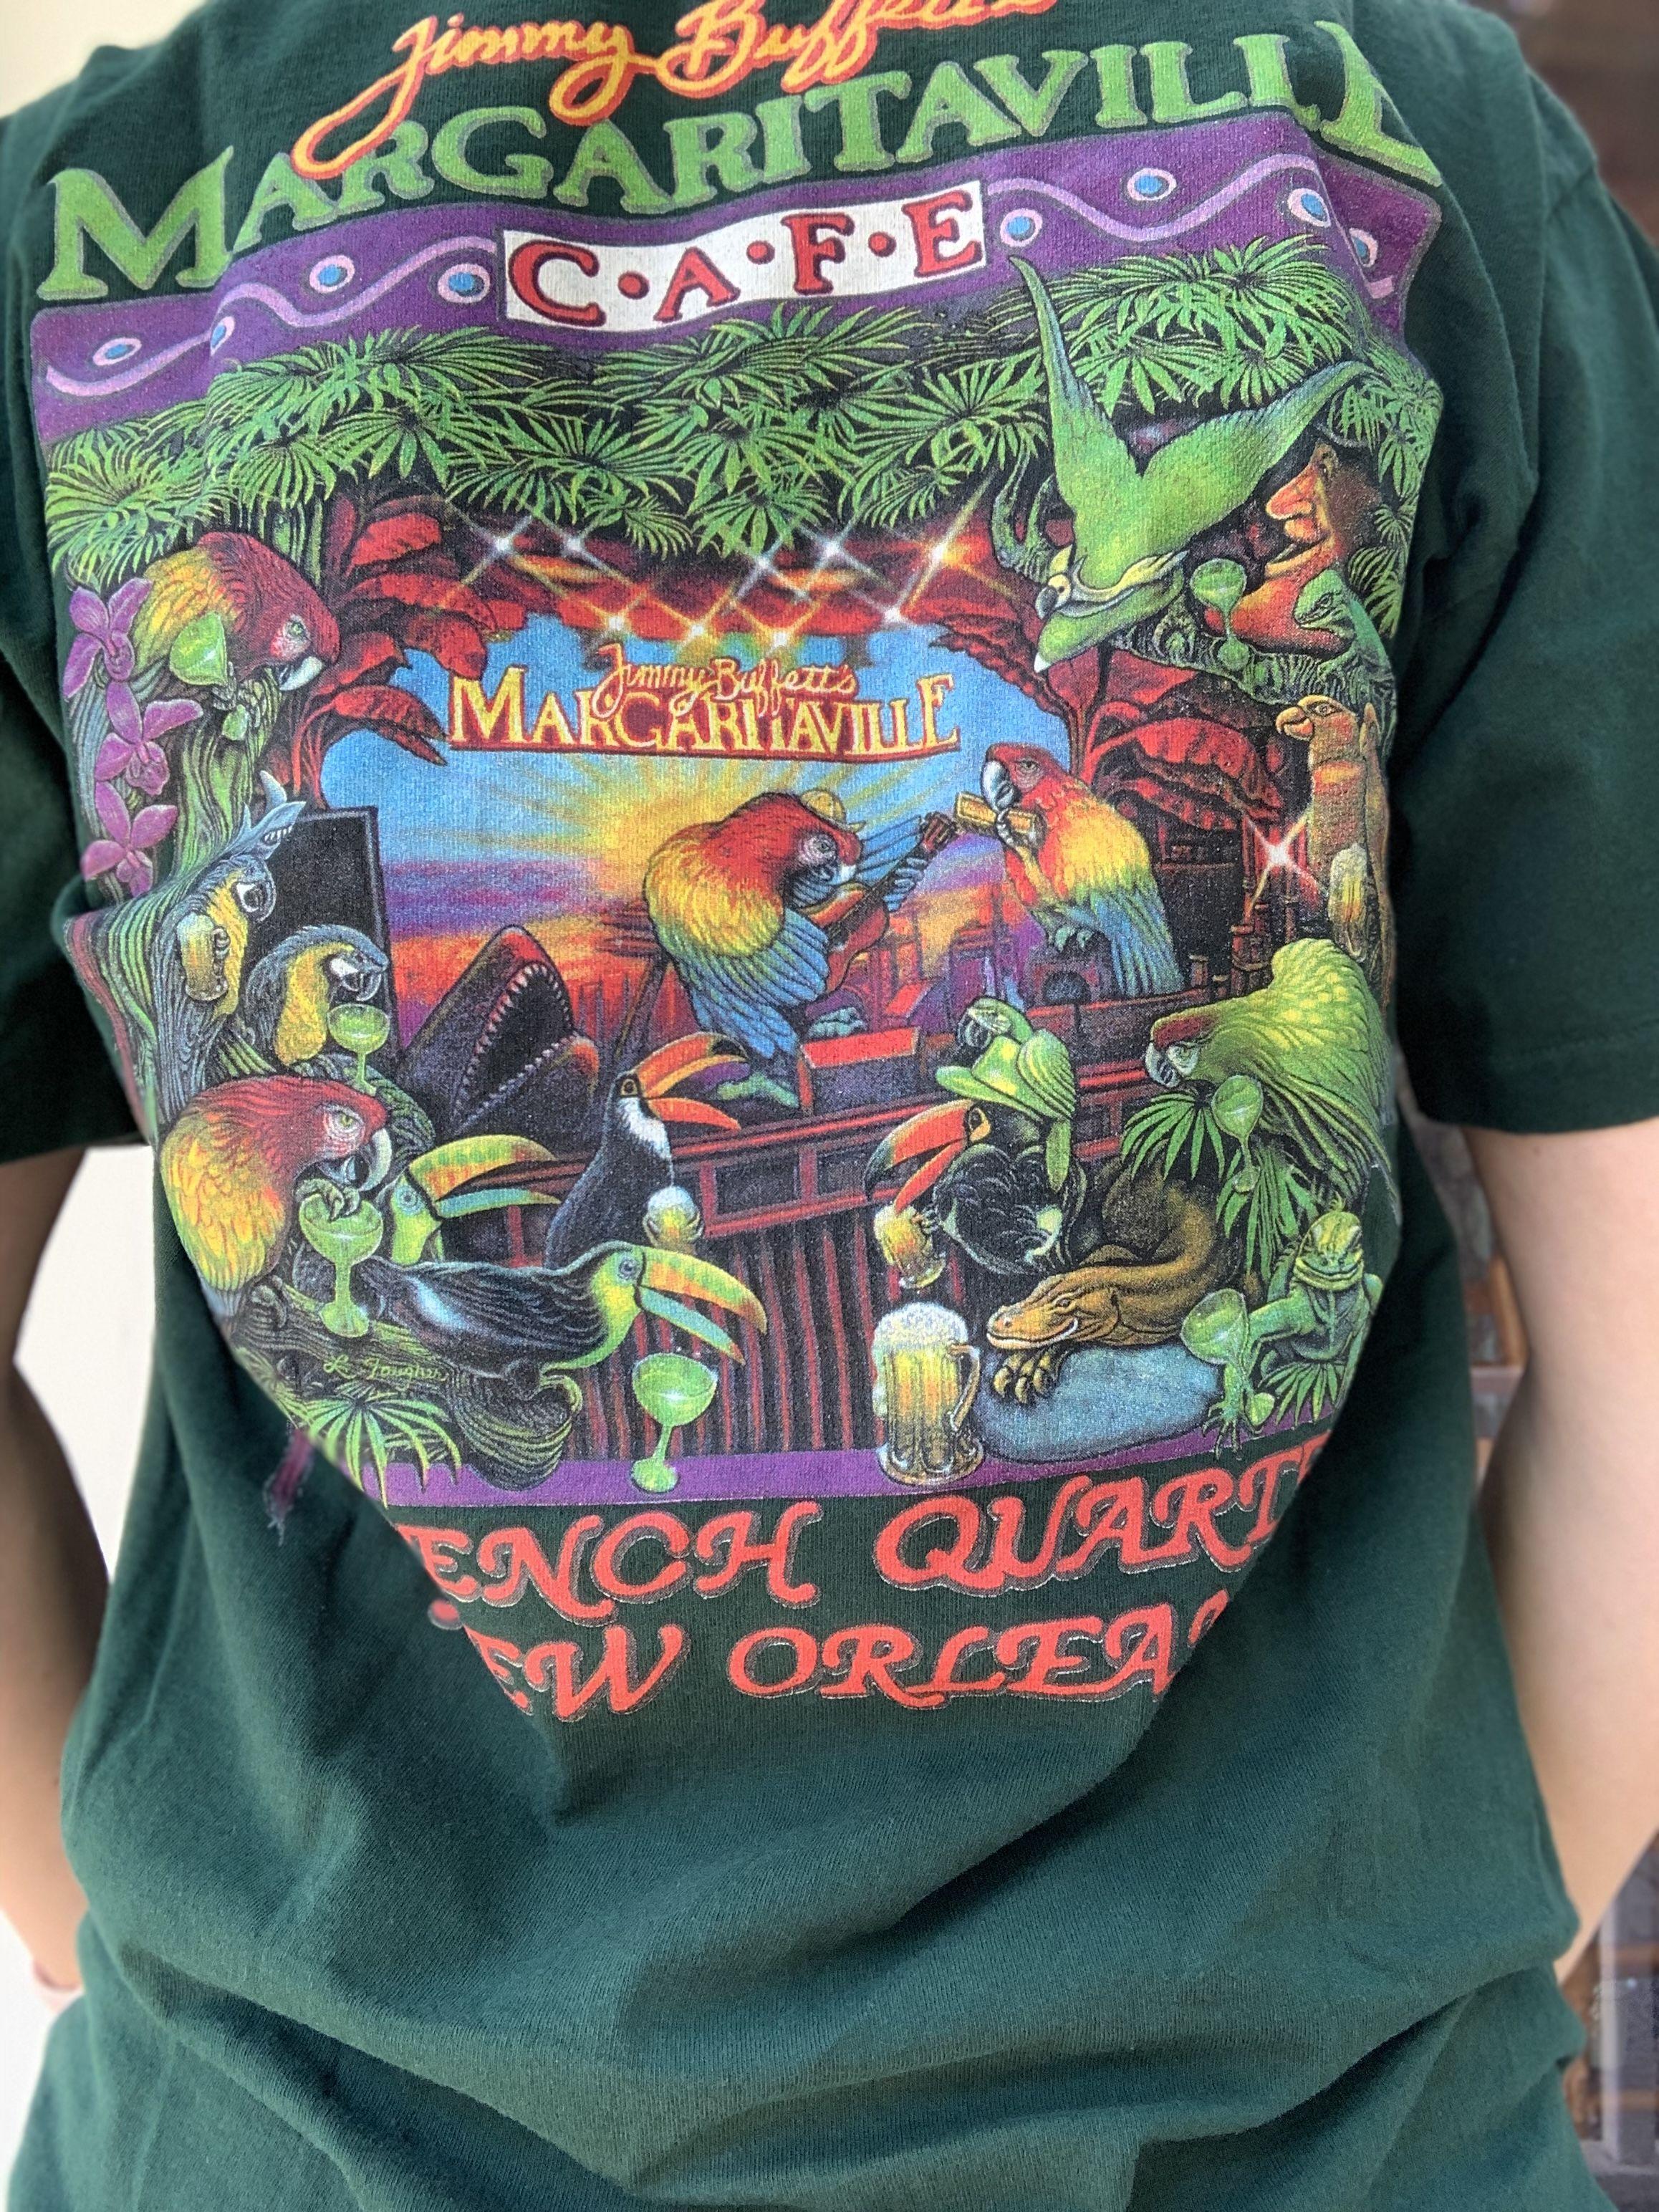 Sold Vintage Jimmy Buffett S Margaritaville T Shirt Vintage Clothing Men Vintage Outfits Clothes [ 3088 x 2316 Pixel ]